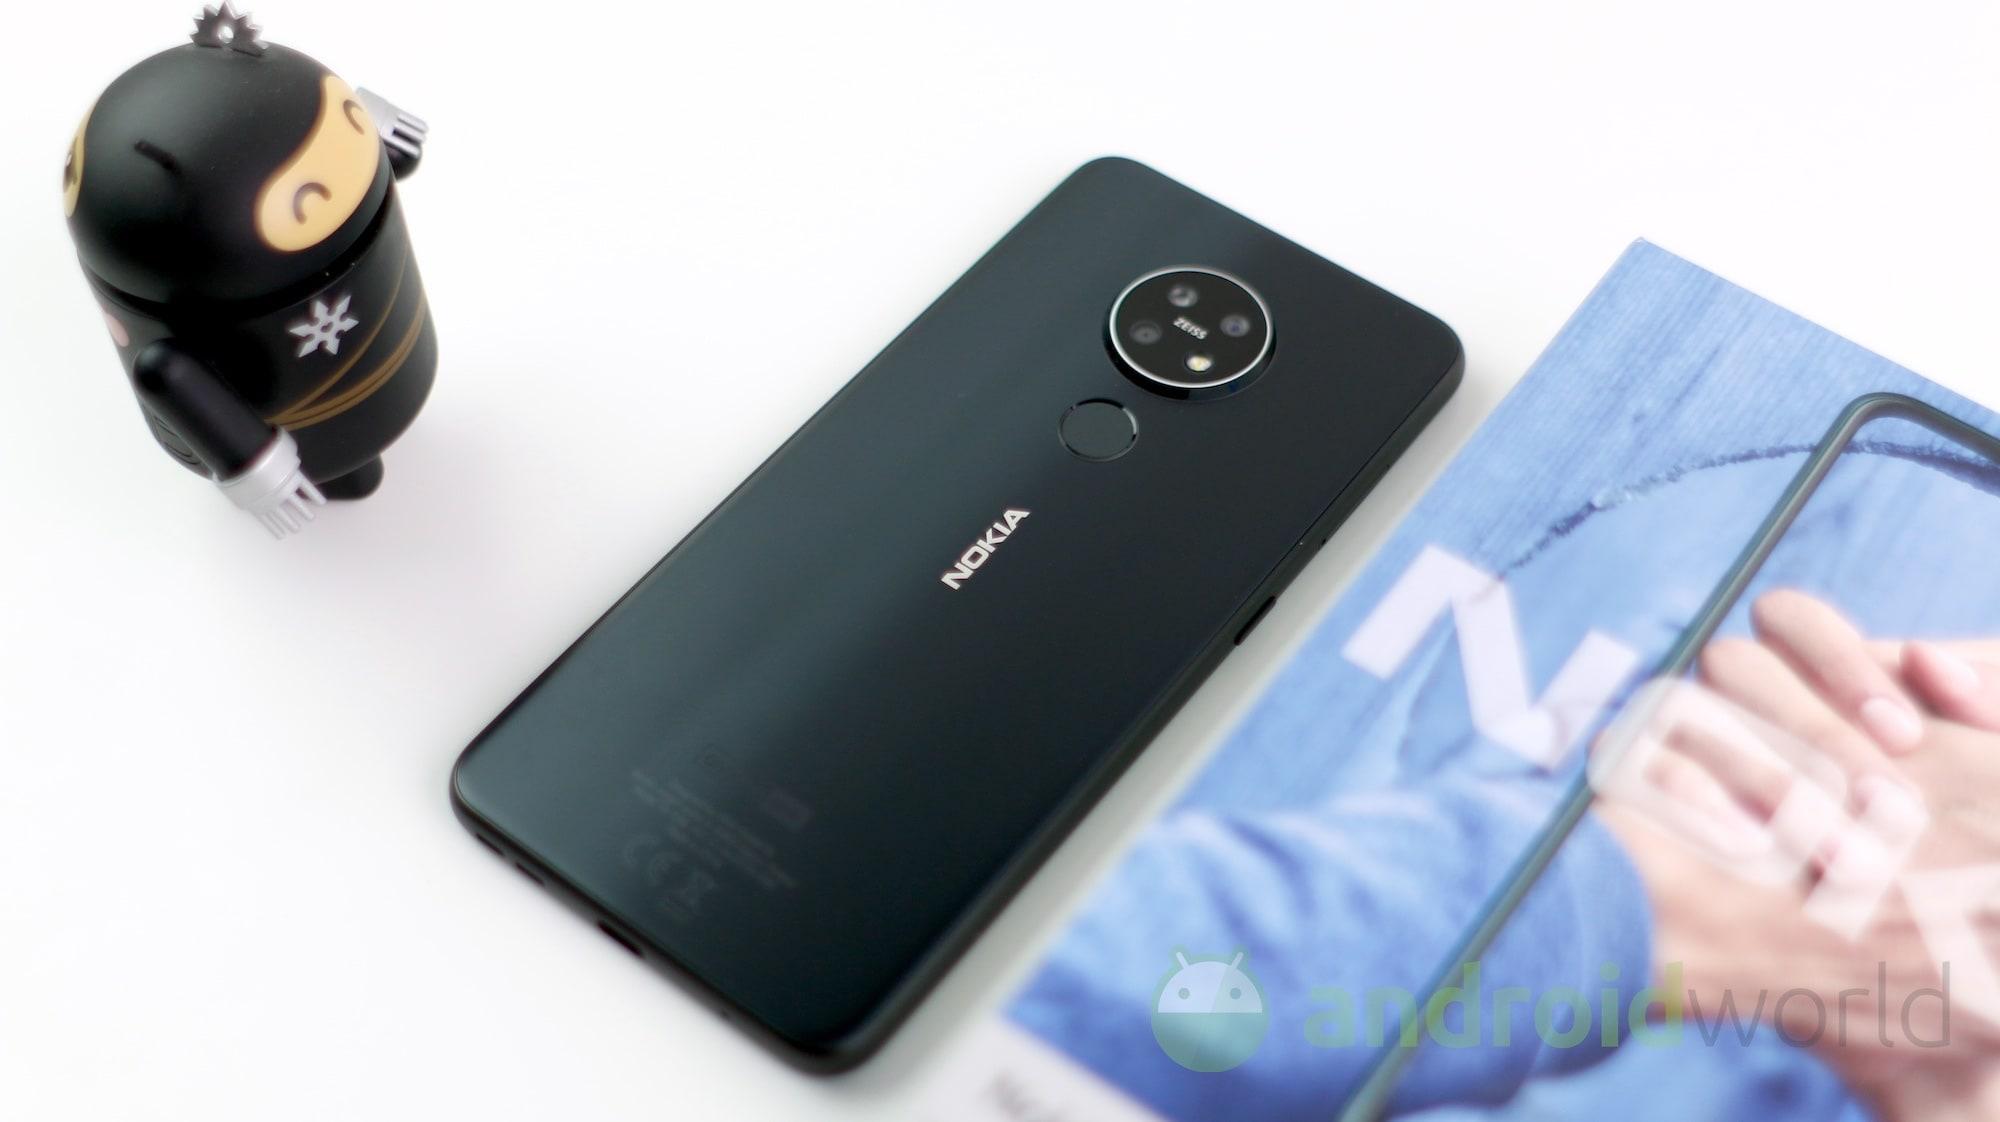 Android 10 arriva su Nokia 3.2, Nokia 4.2 e Nokia 7.2 anche in Italia!